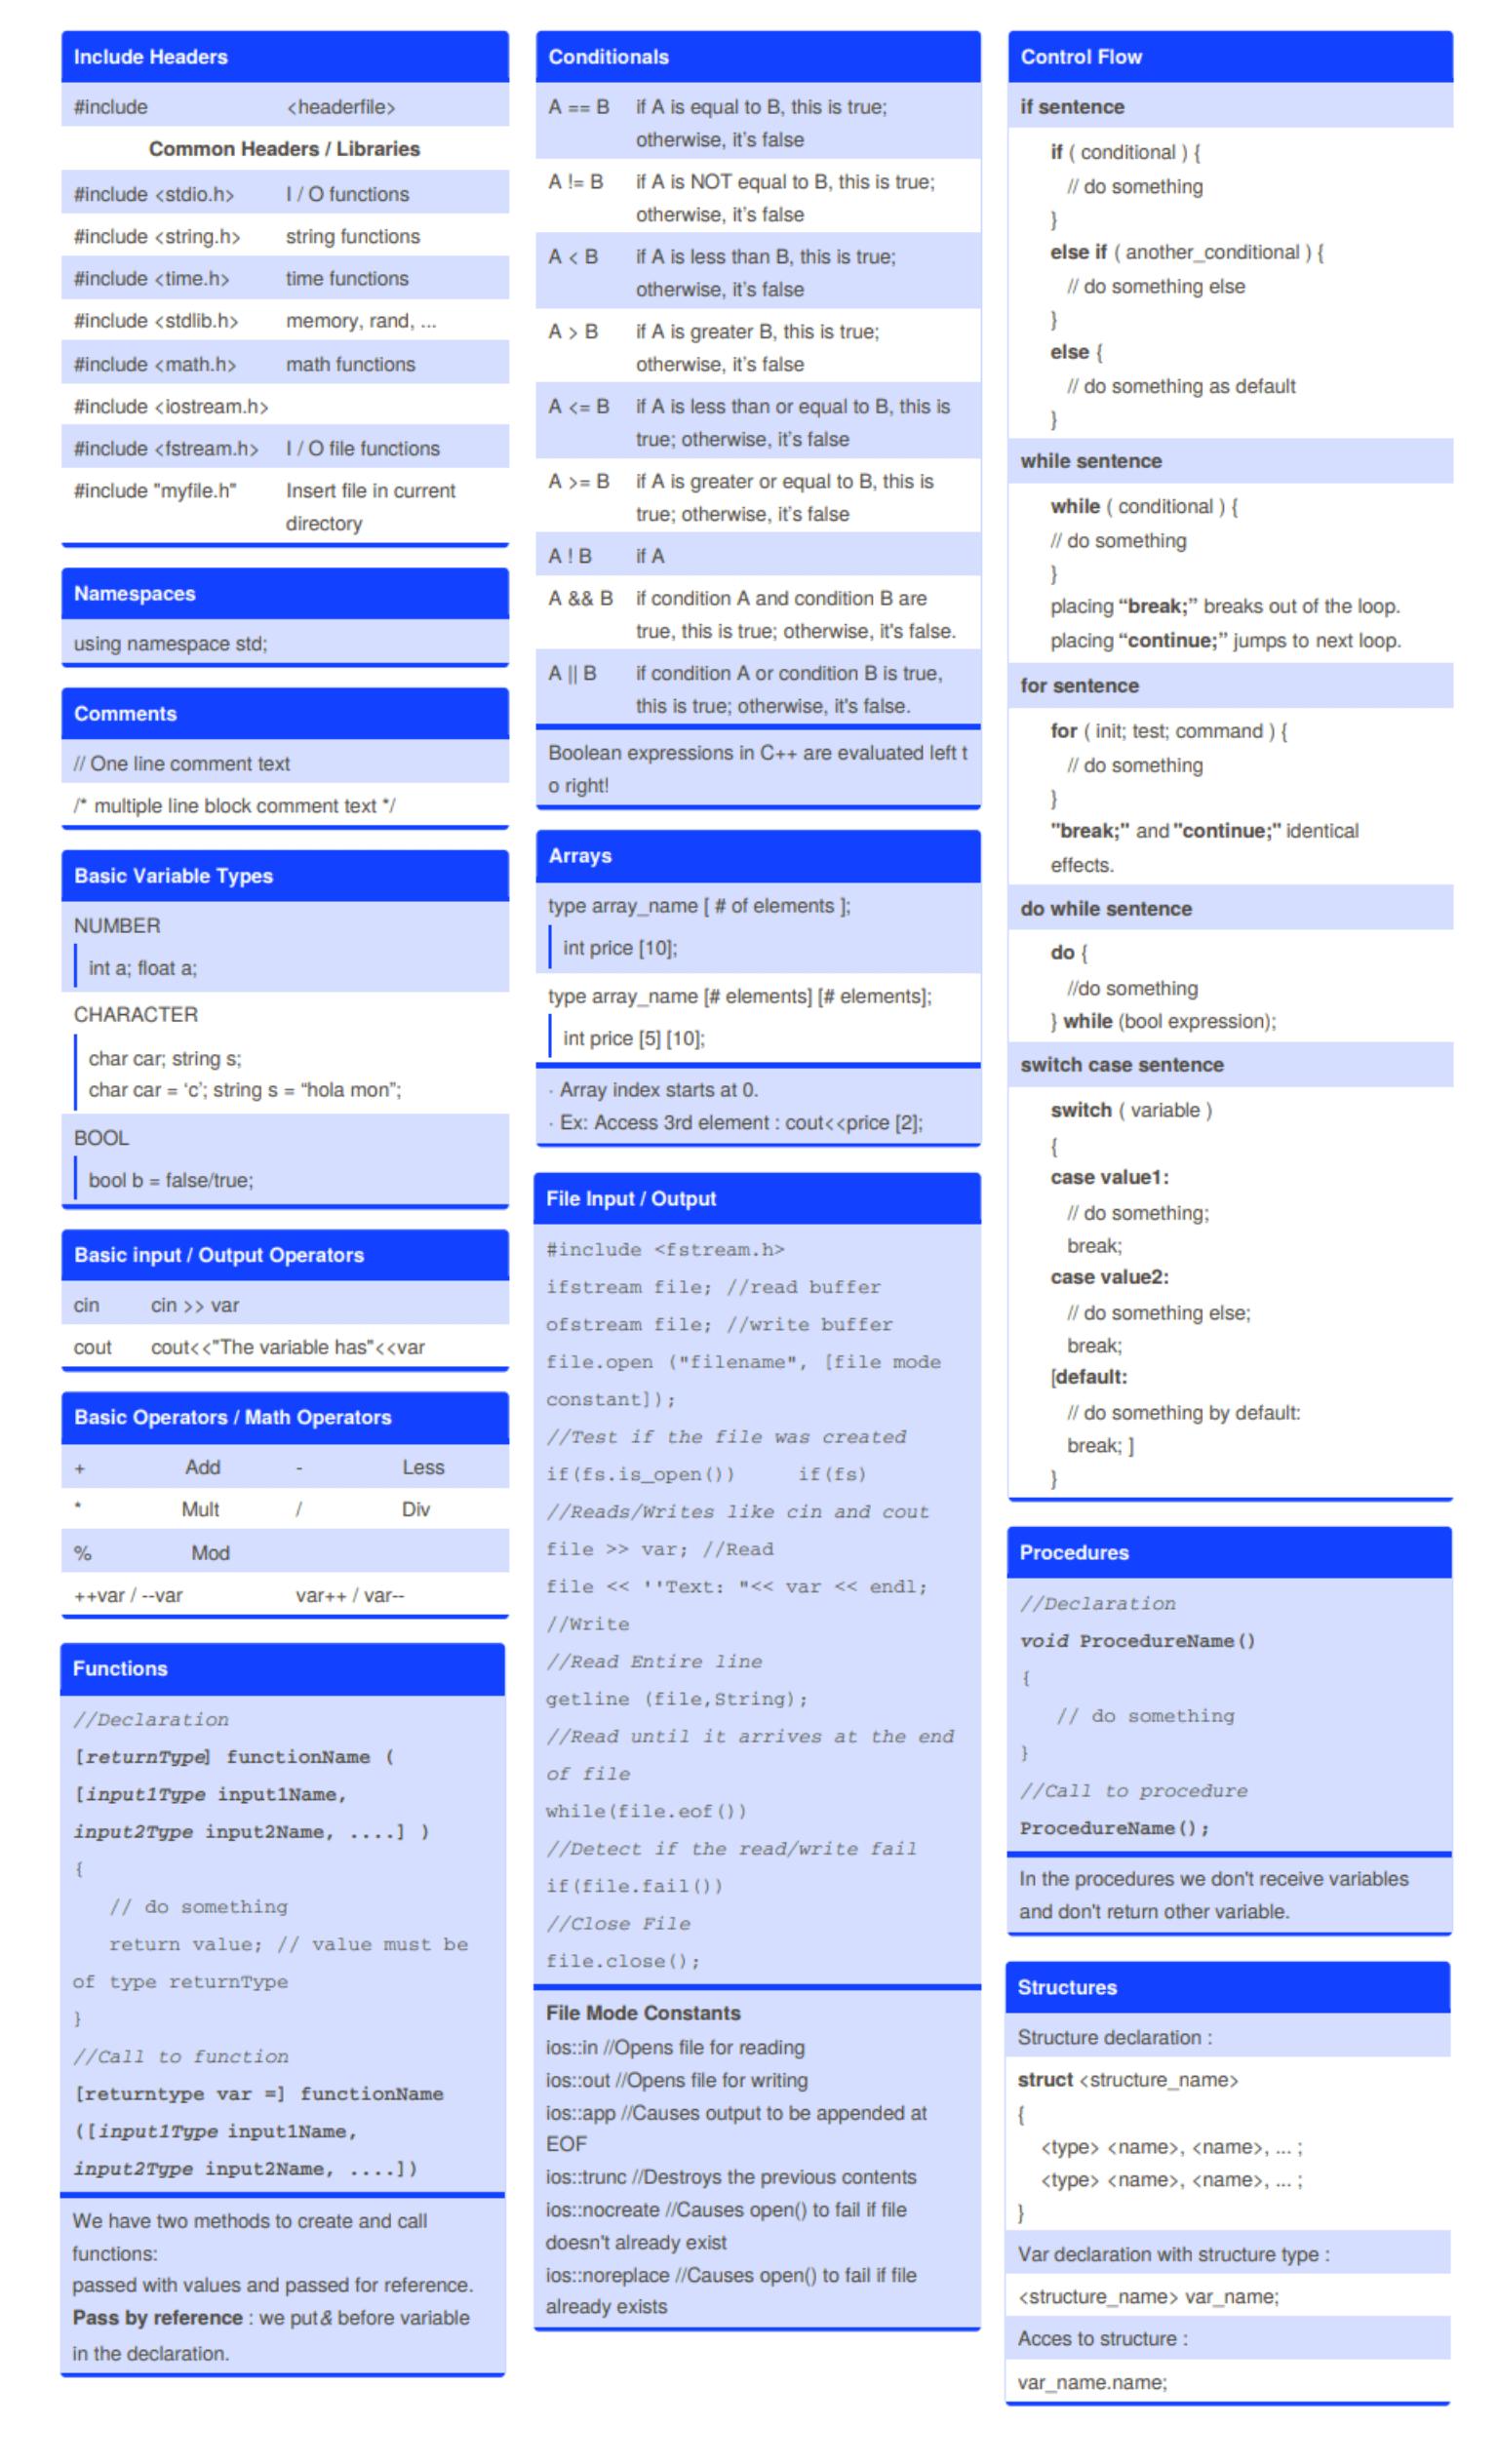 Шпаргалка по C++ для начинающих